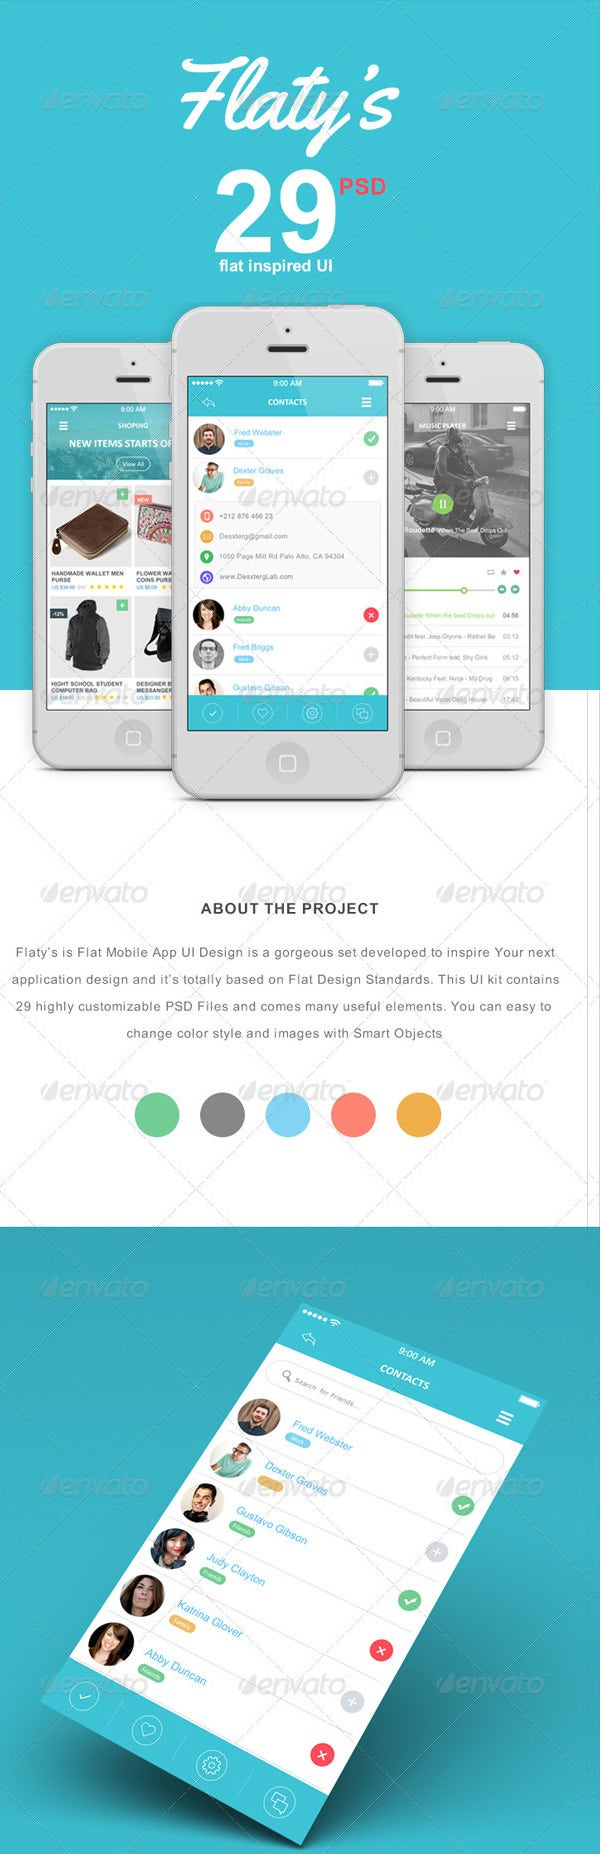 flat mobile app ui kits